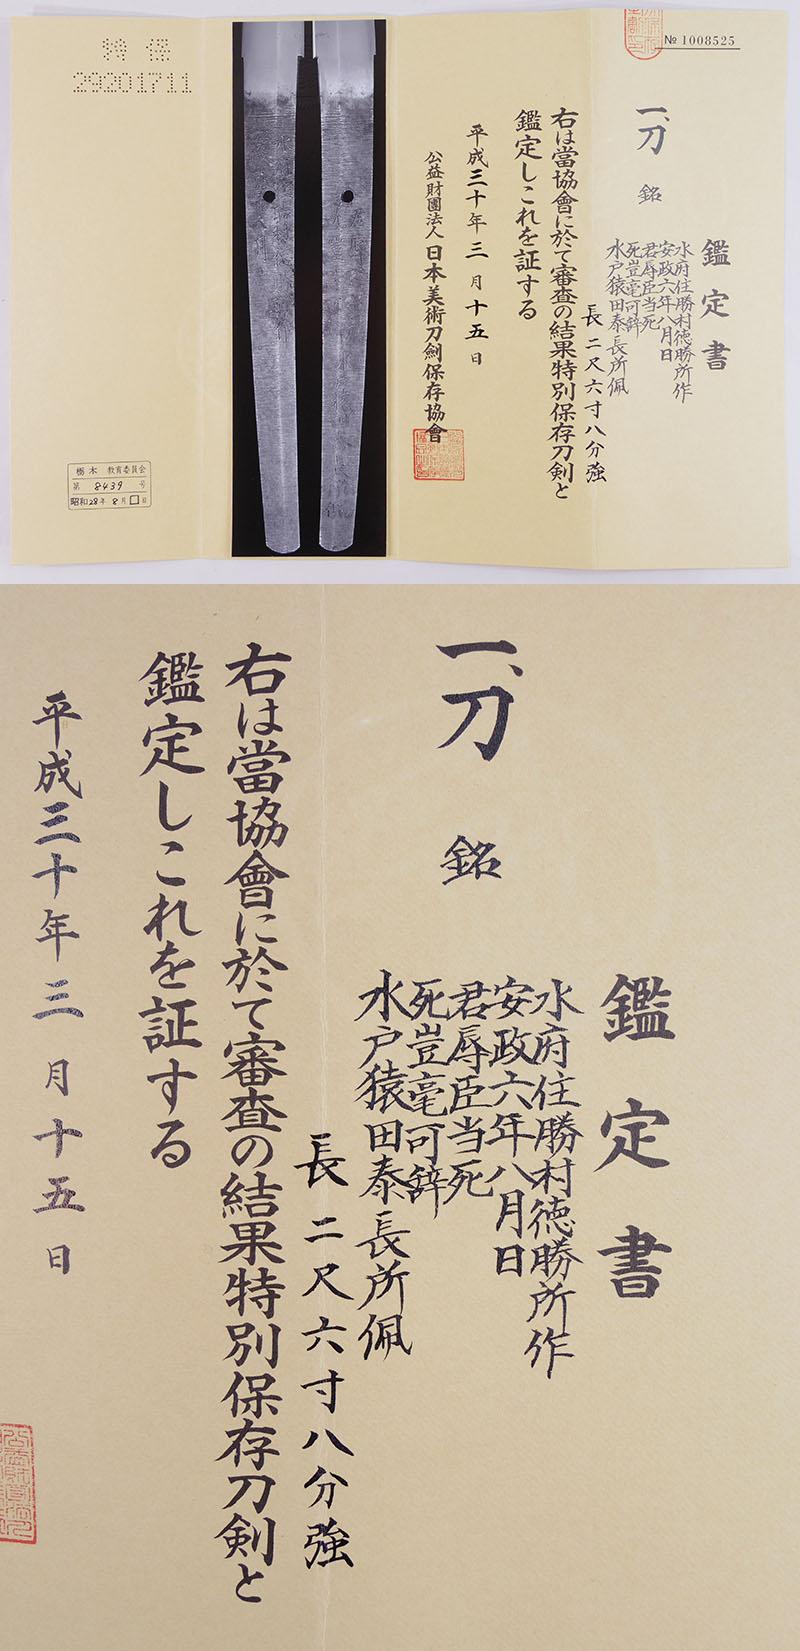 水府住勝村徳勝所作 Picture of Certificate